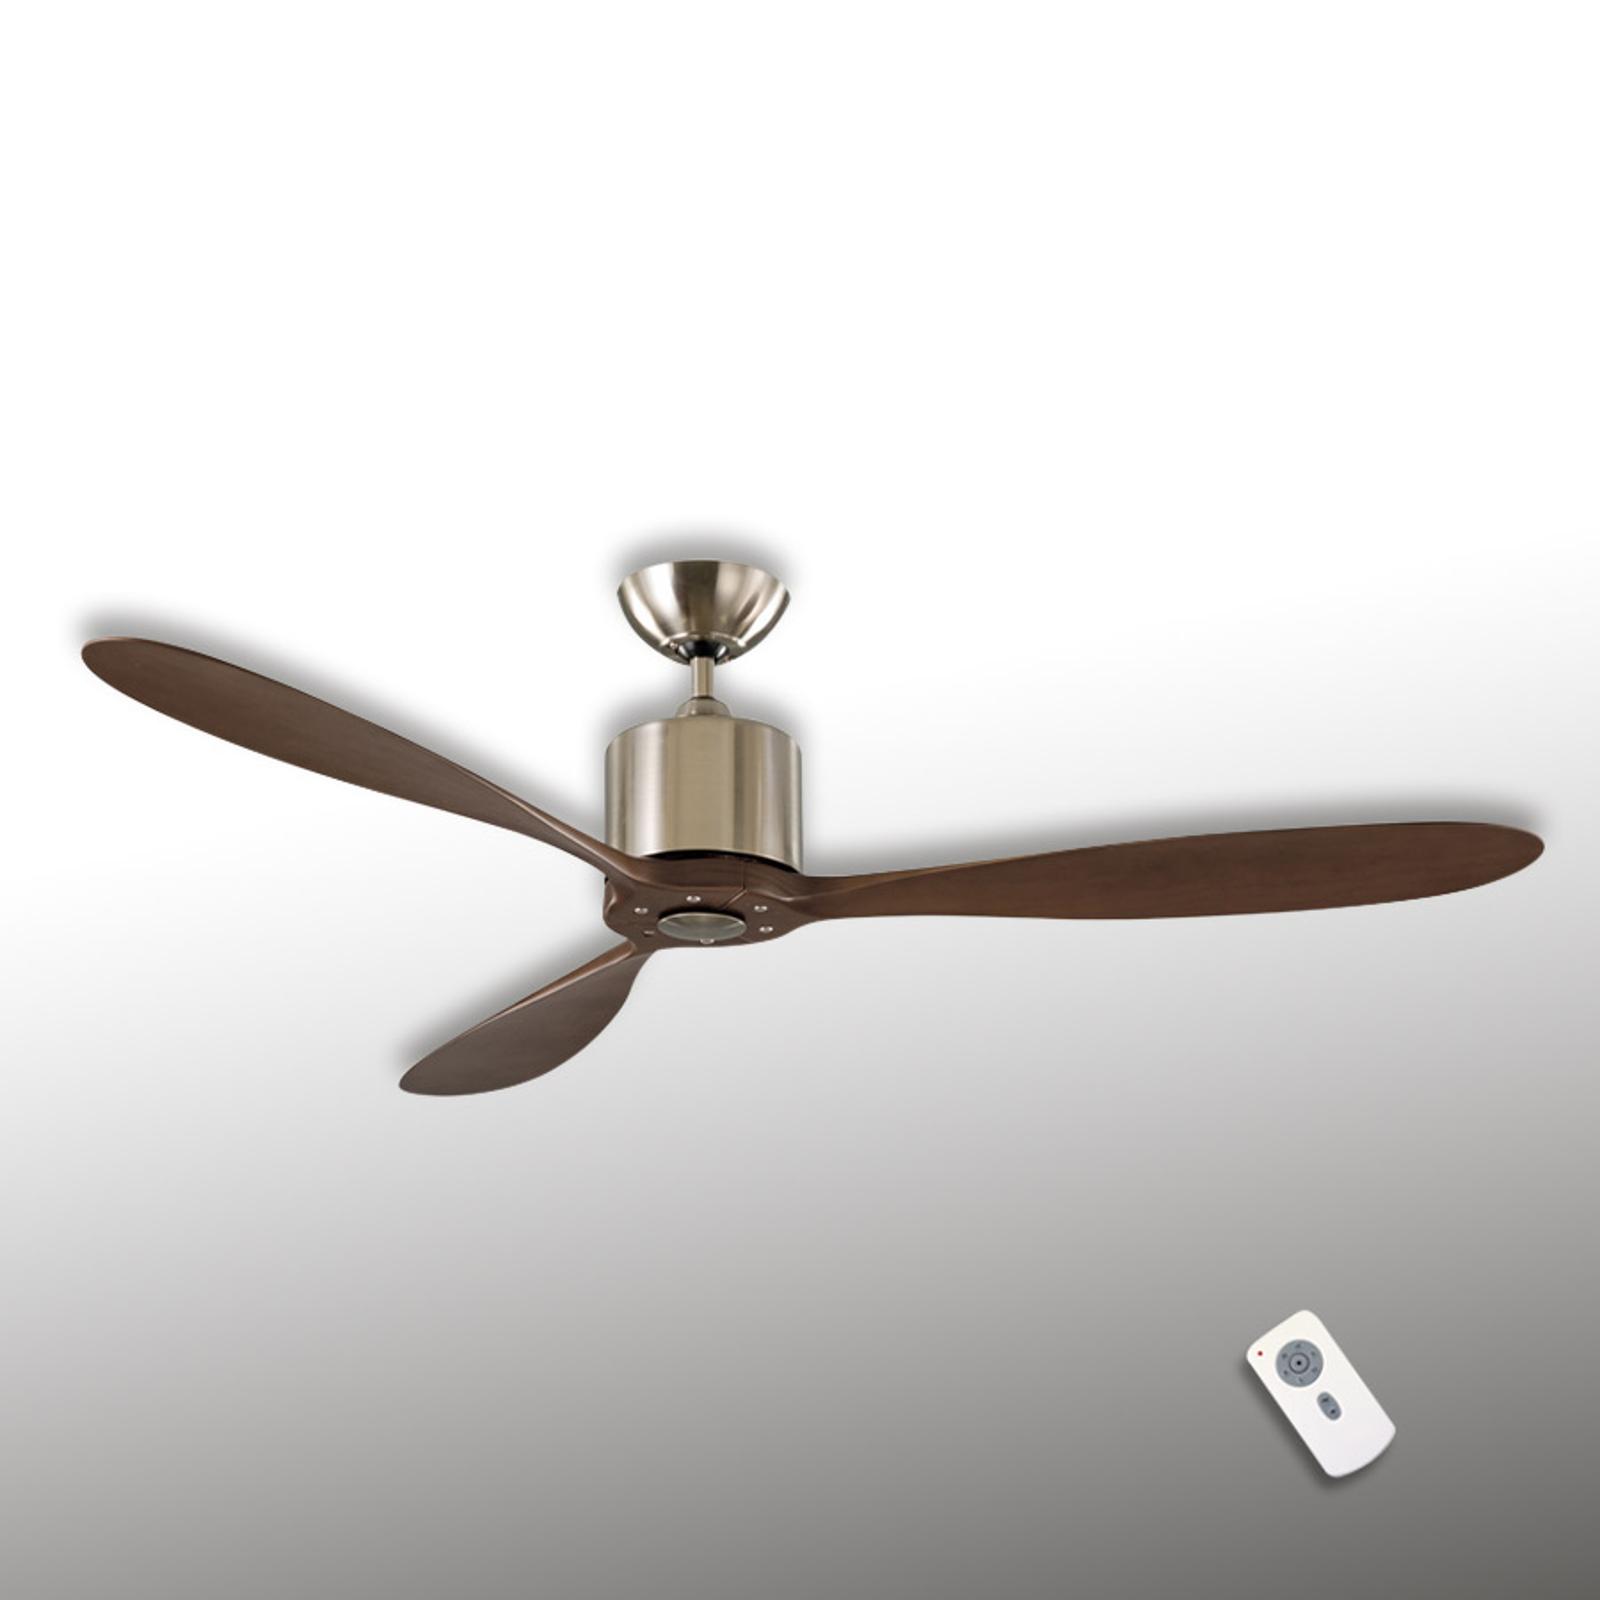 Aeroplan Eco loftventilator, krom, nøddetræ